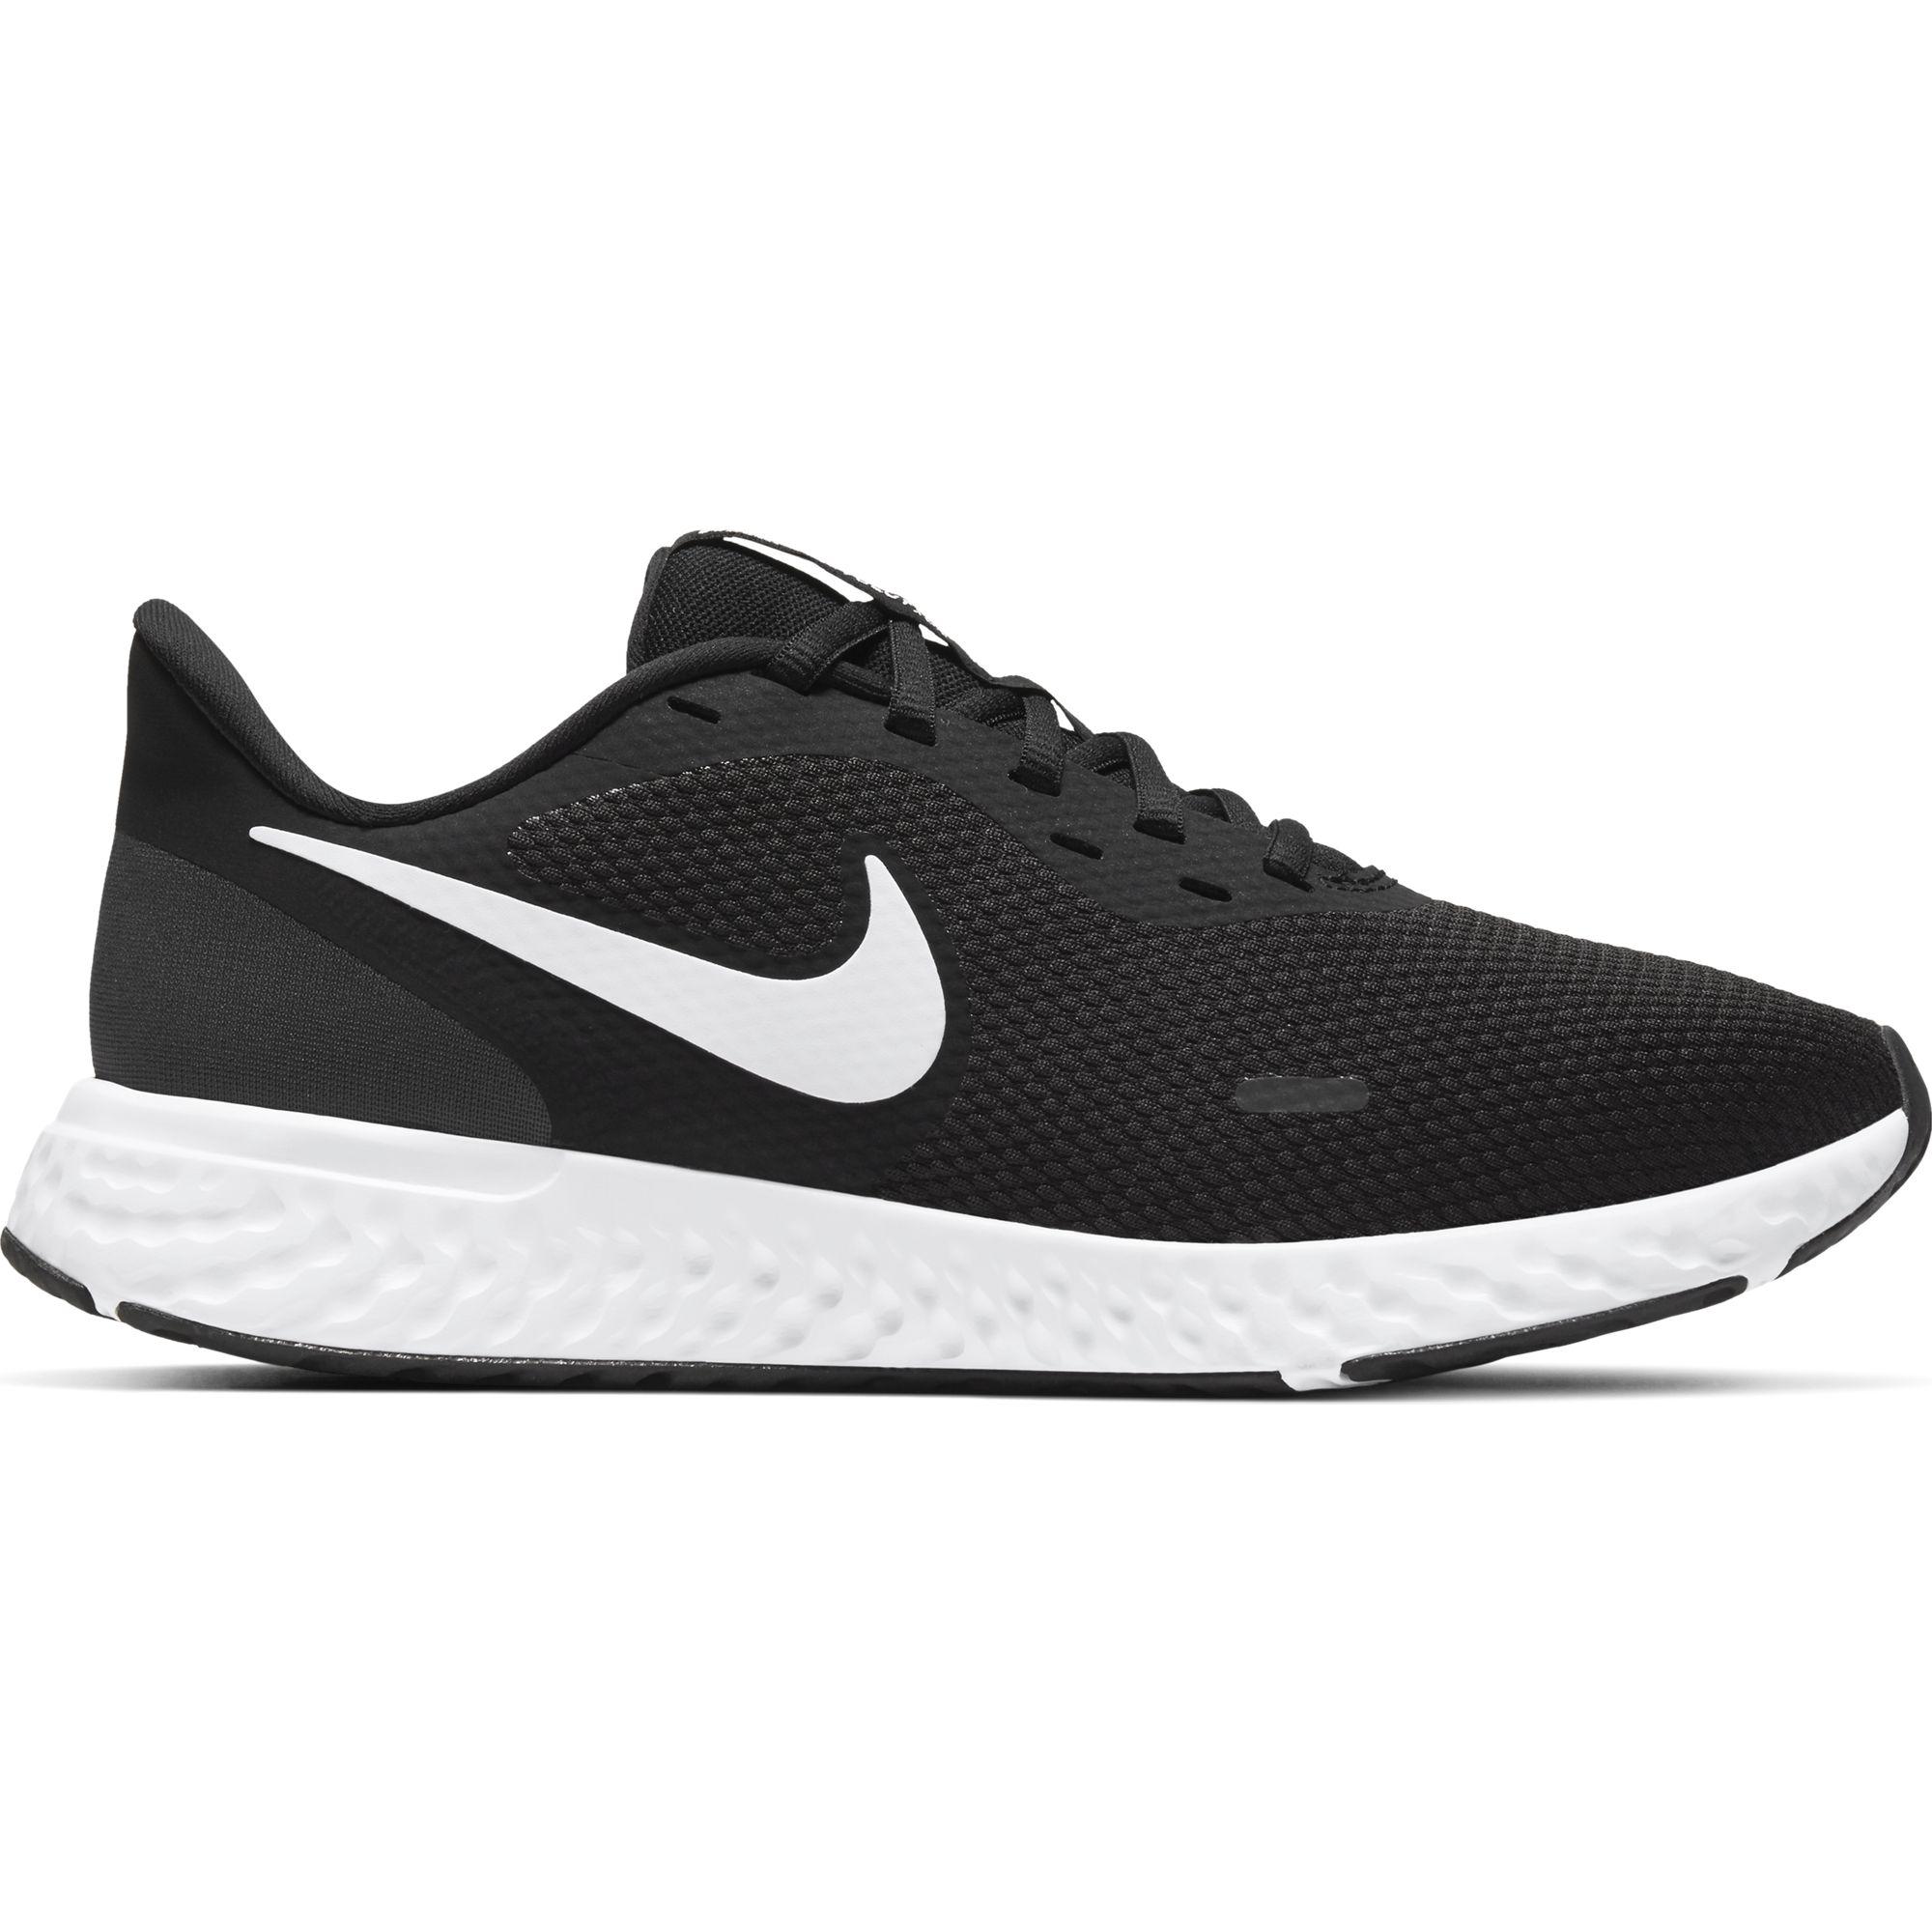 Women's Revolution 5 Running Shoe, Black/White, swatch